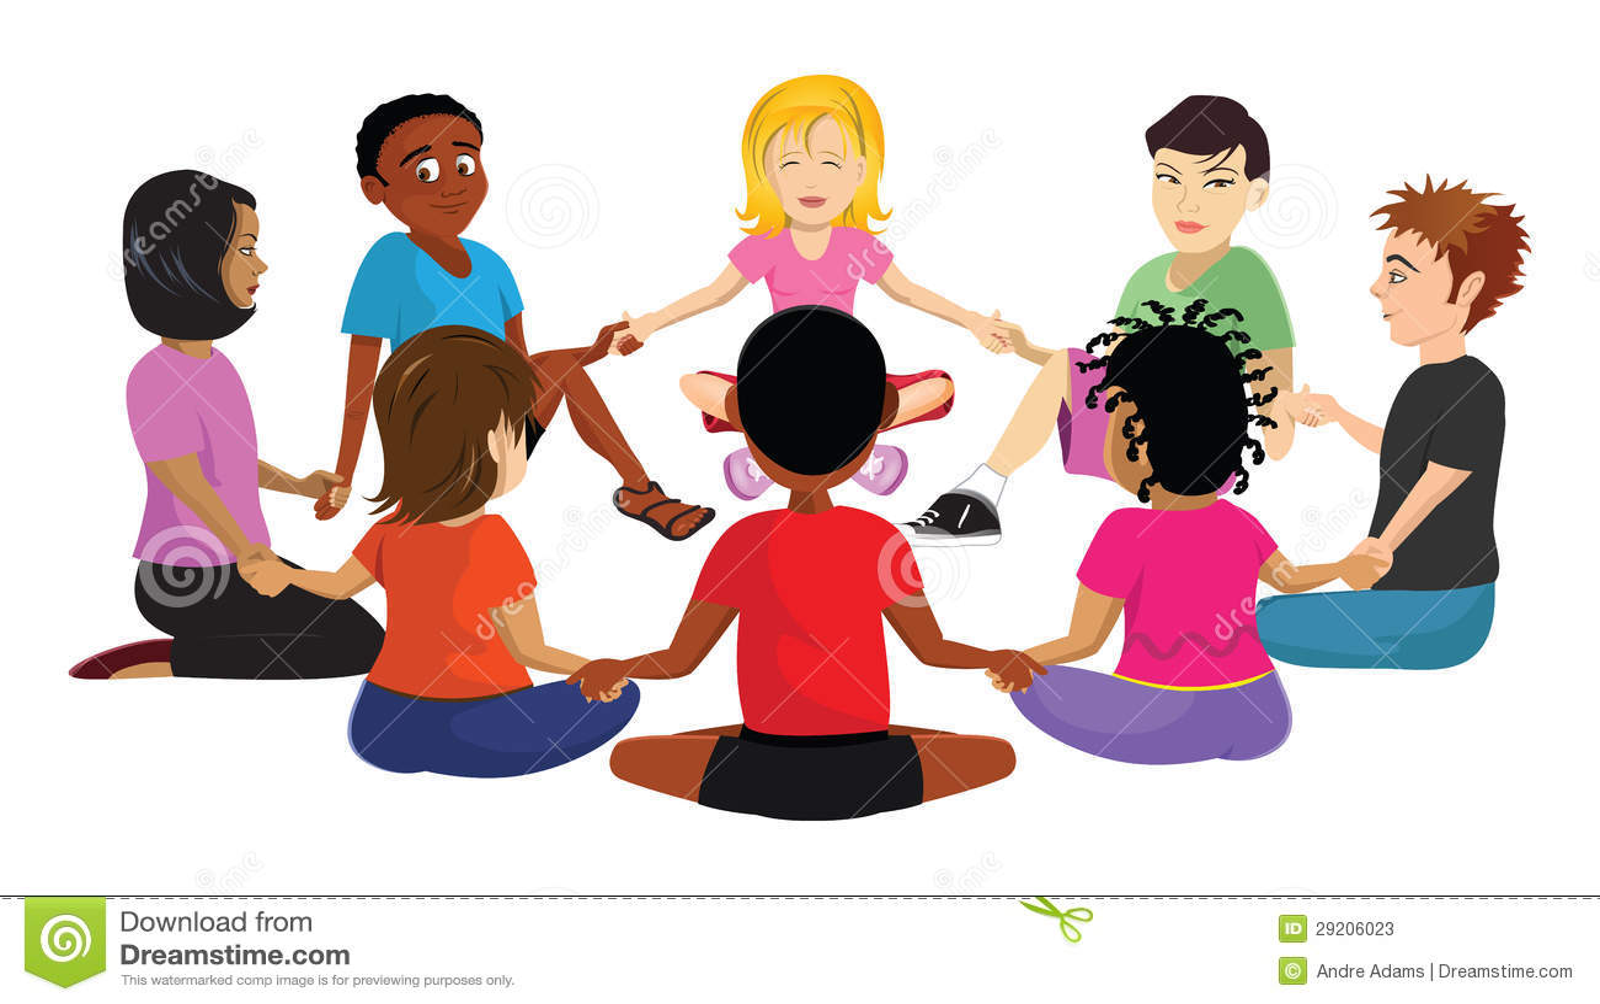 Kids I Group Time Clip Art